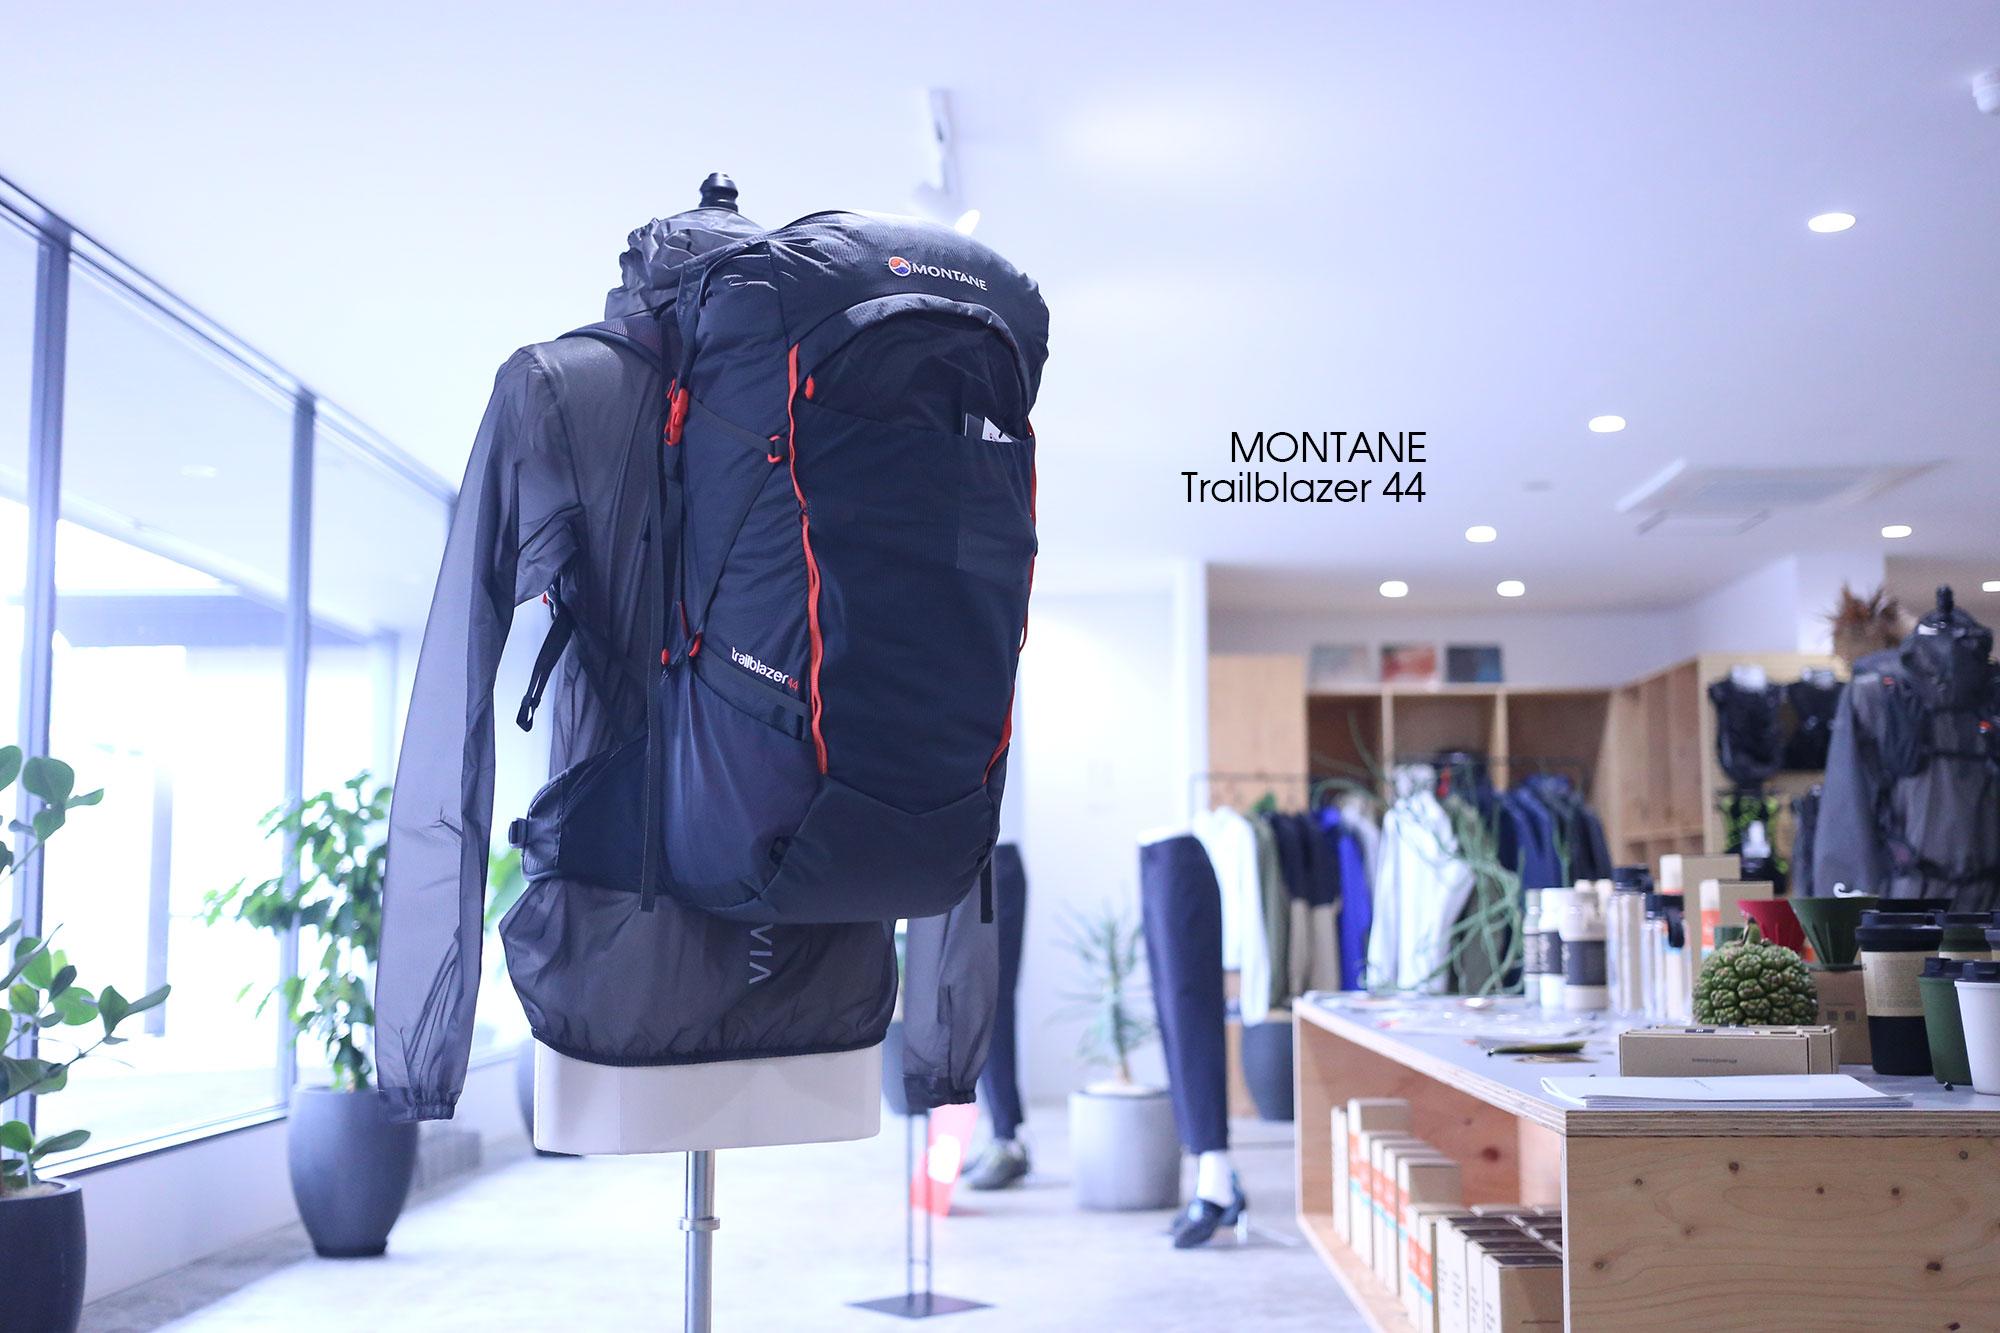 MONTANE Trailblazer 44